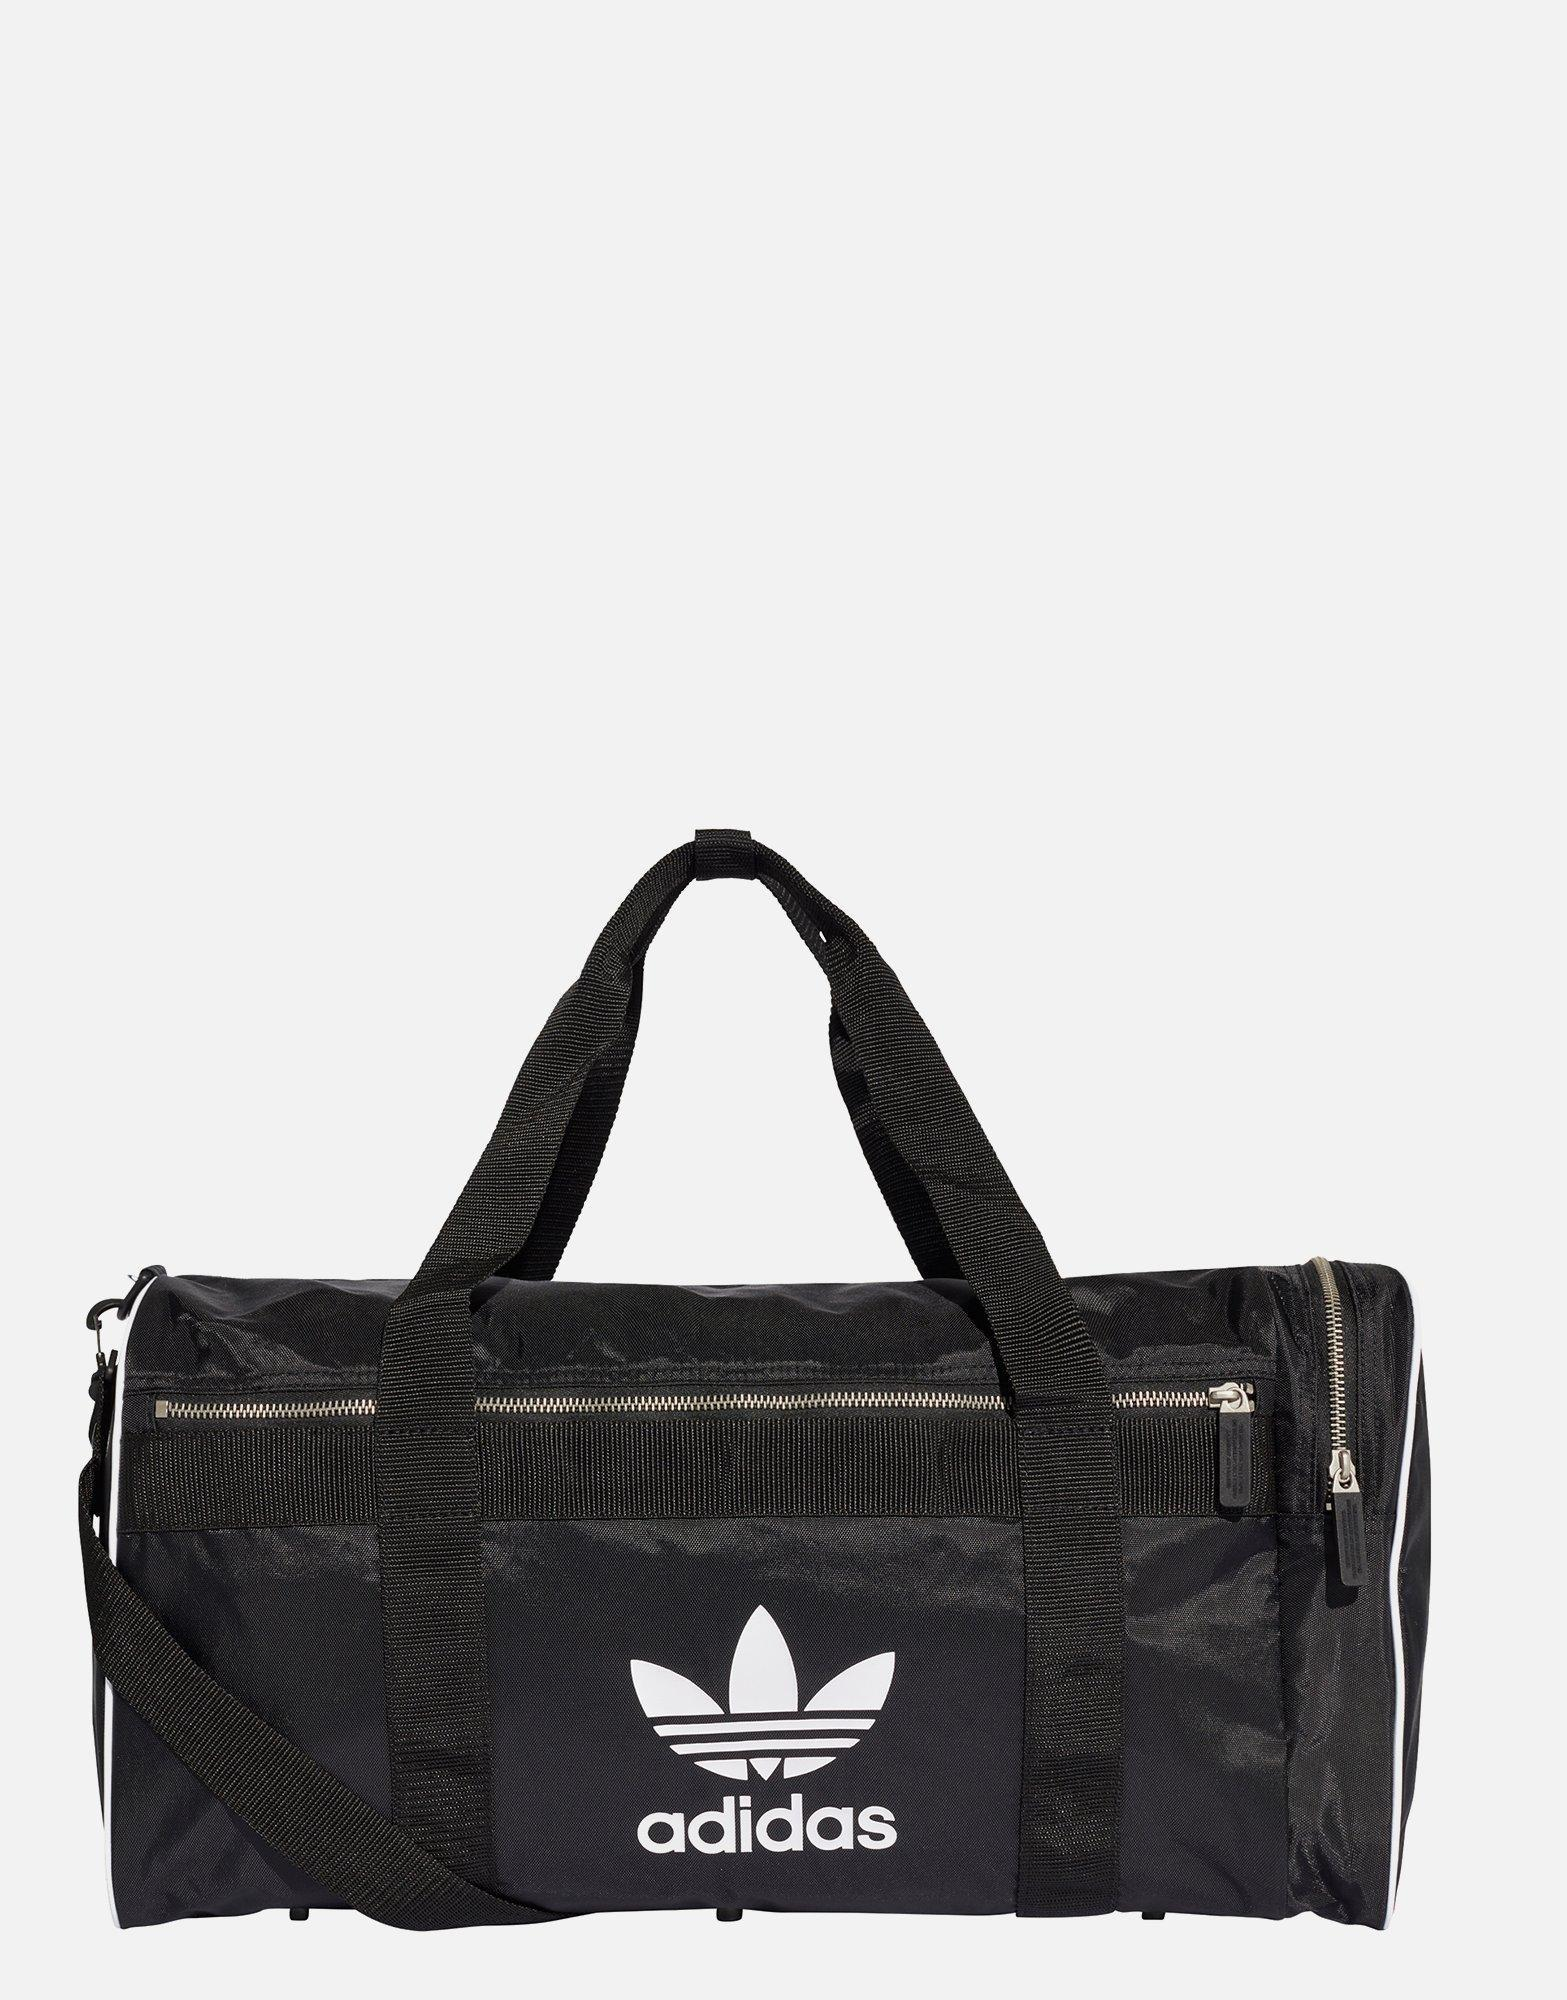 8b68c61b6e7d Adidas - Black Duffel Bag Large for Men - Lyst. View fullscreen